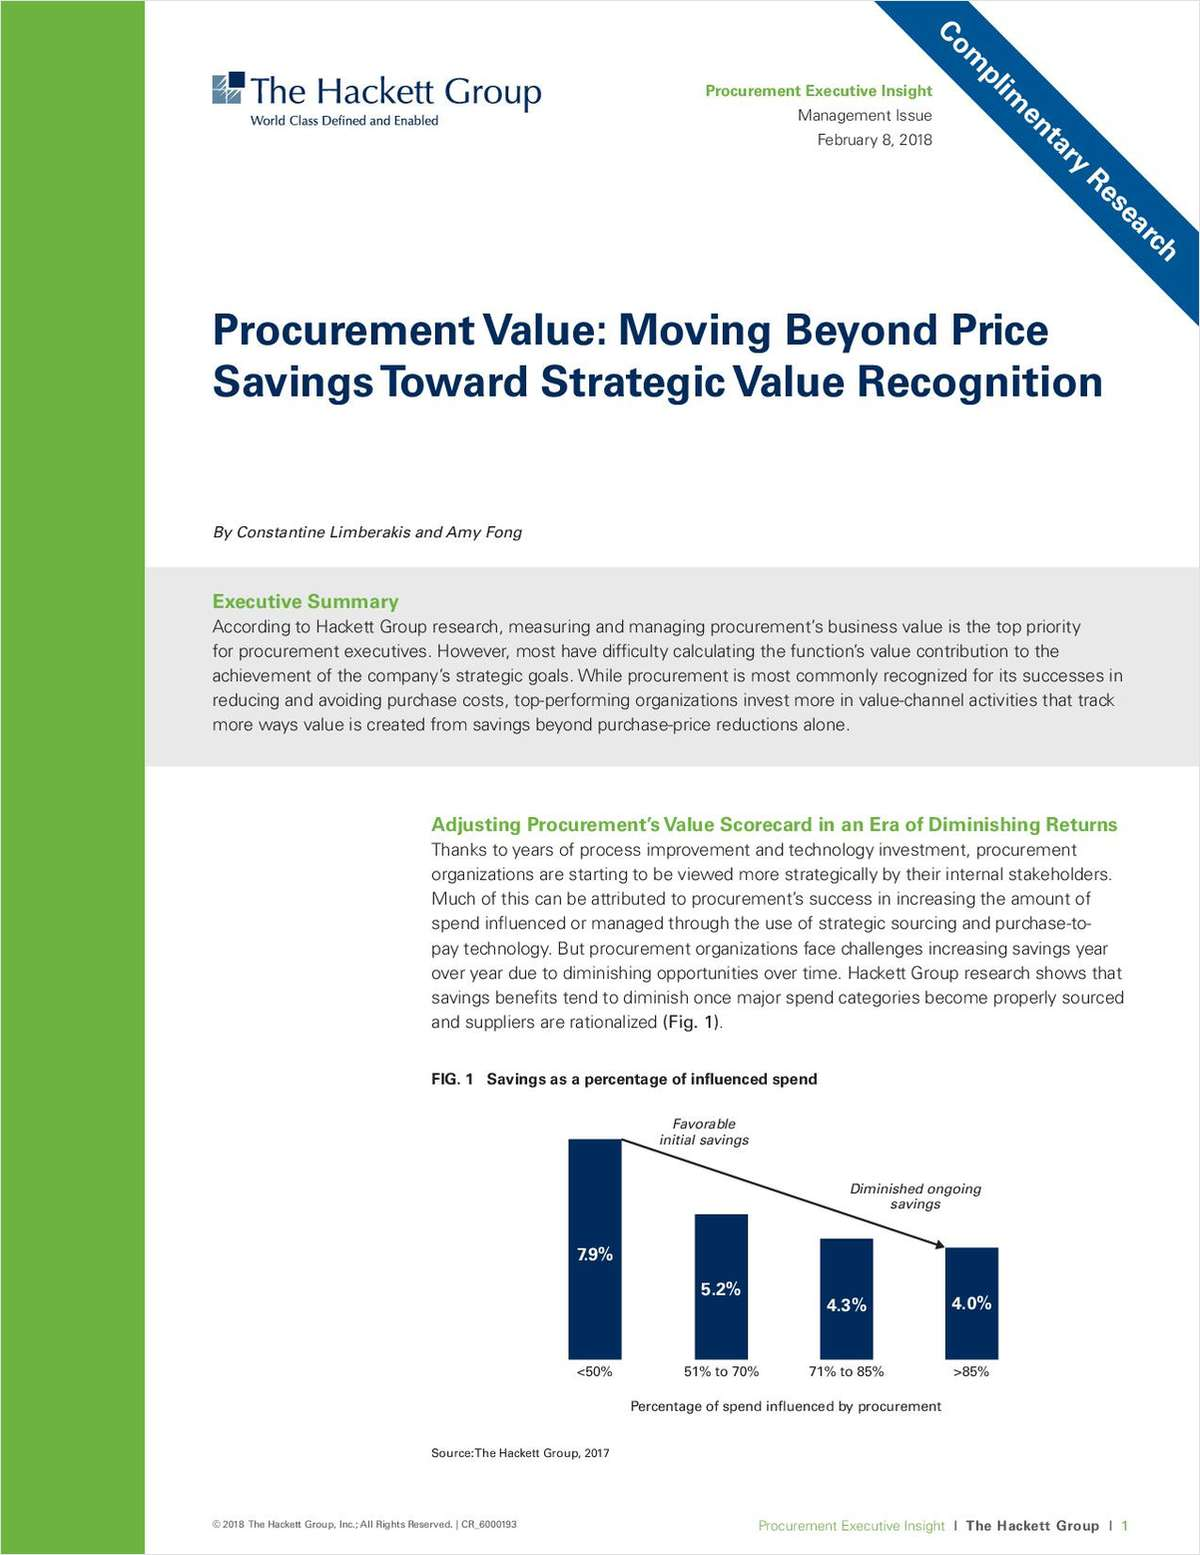 Procurement Value: Moving Beyond Price Savings Towards Strategic Value Recognition